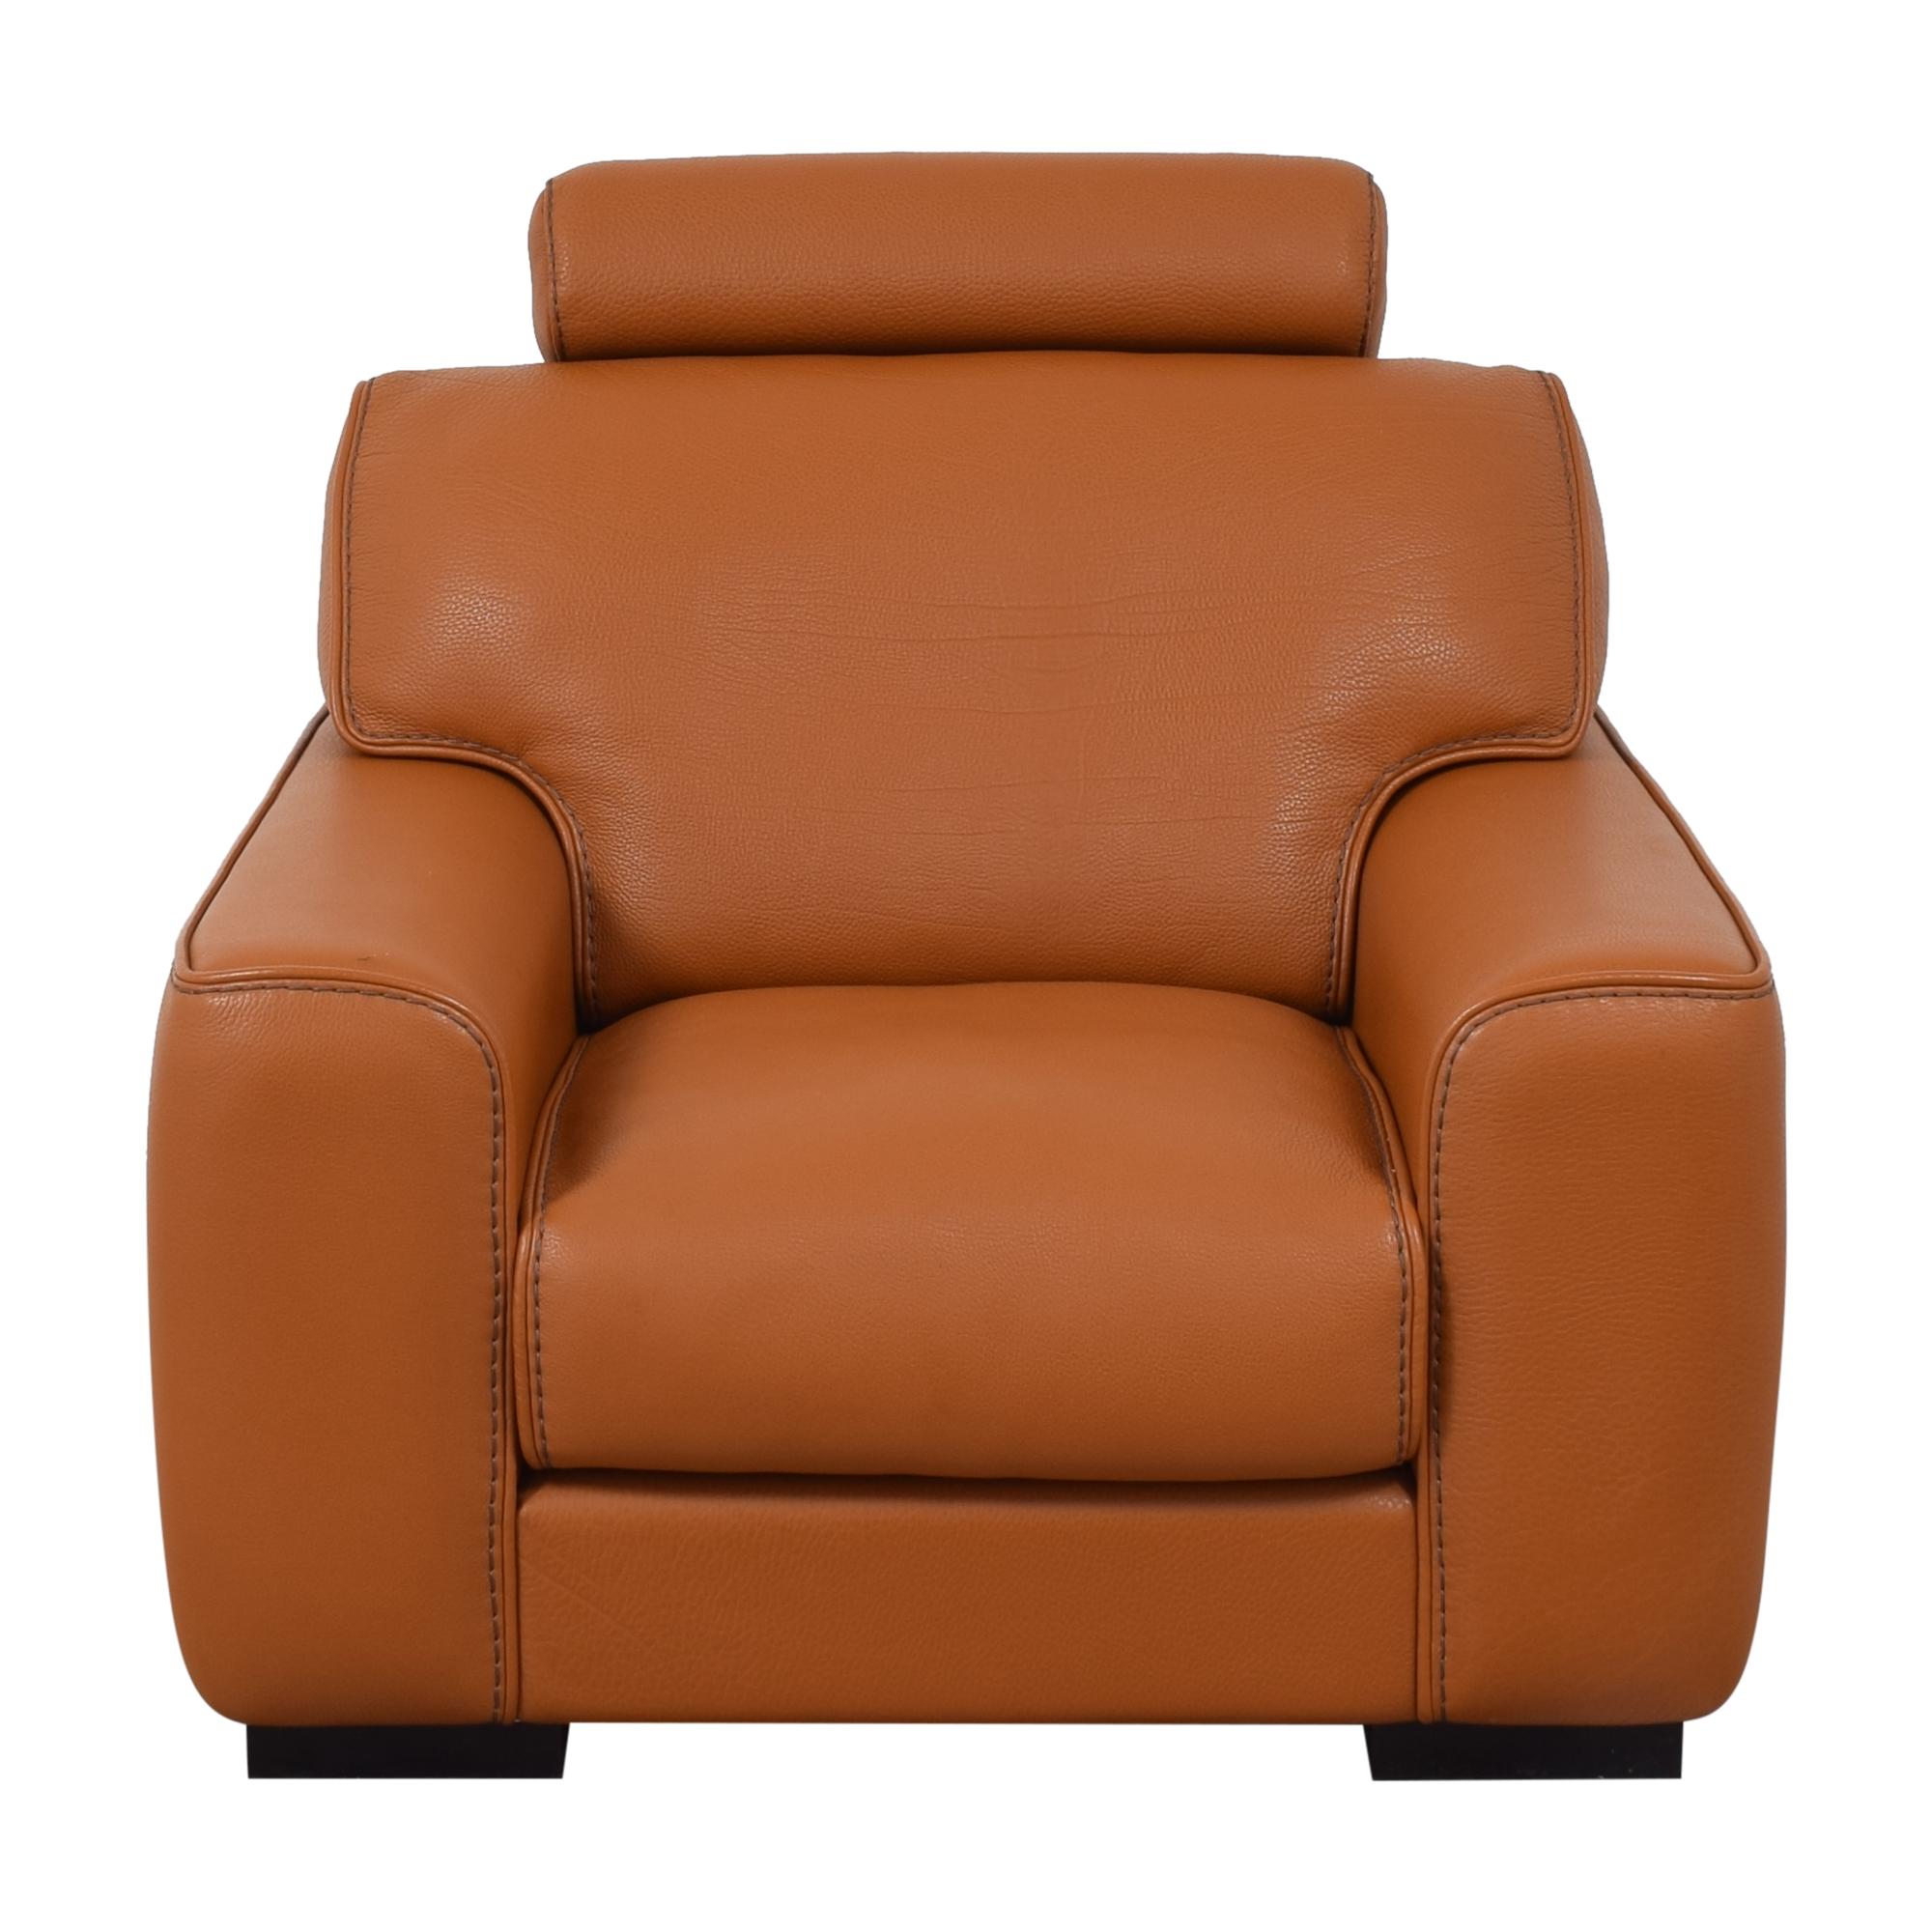 Roche Bobois Roche Bobois Mid-Century Modern Armchair  used